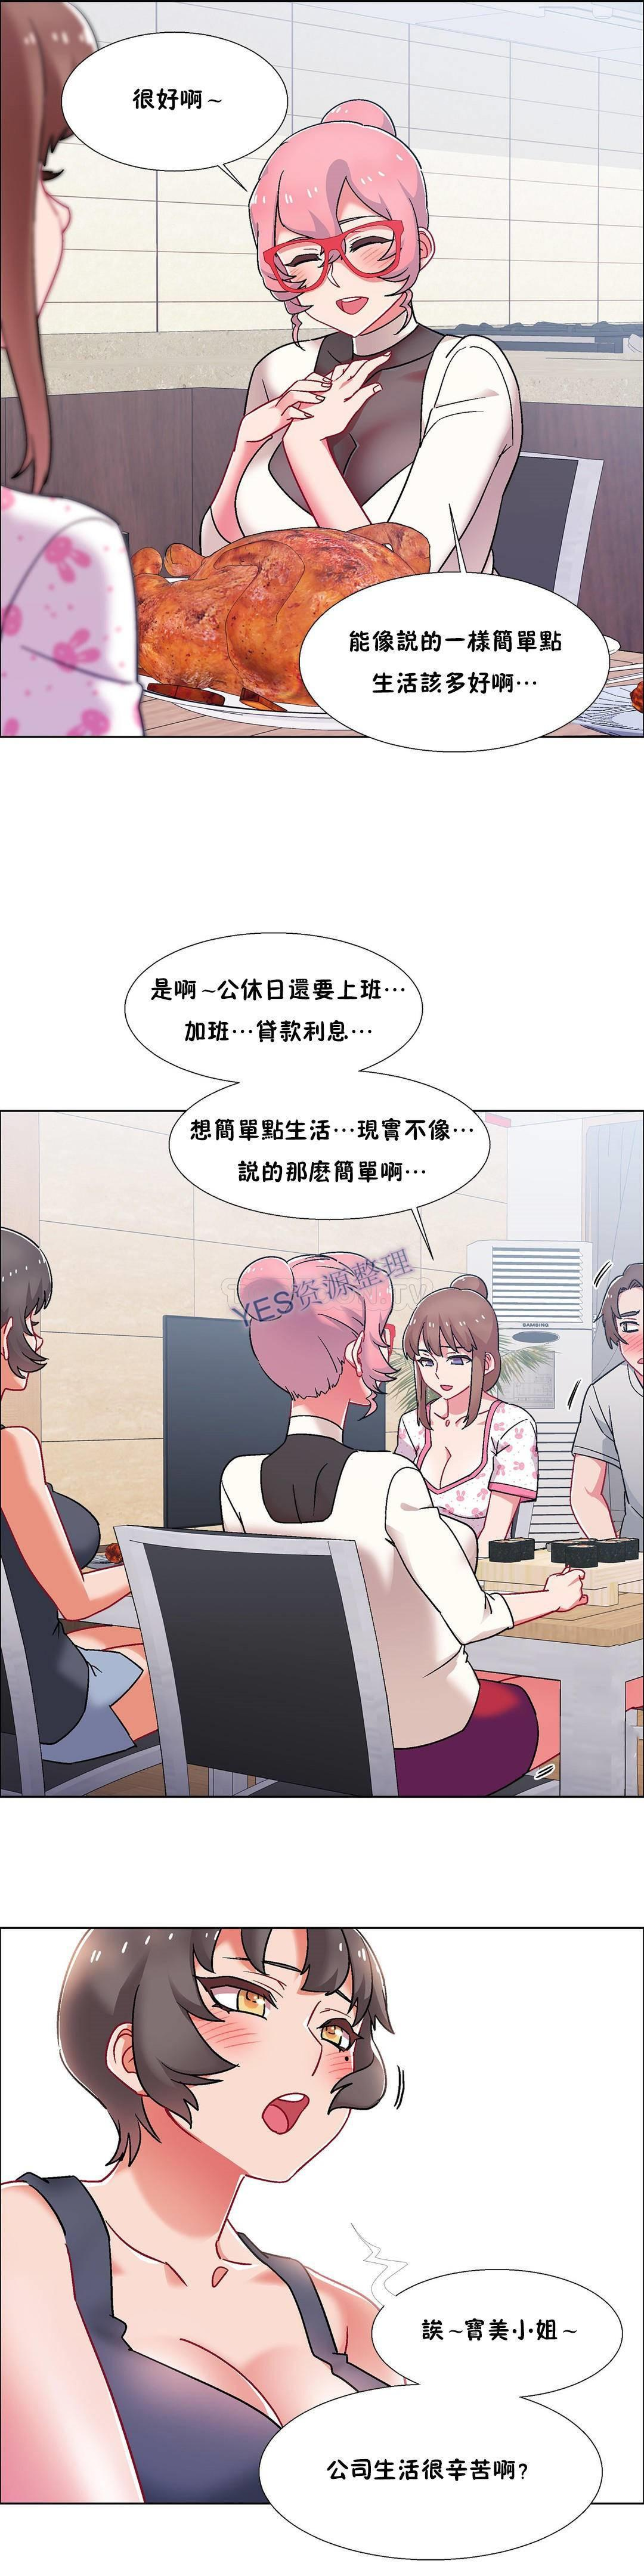 [Studio Wannabe] Rental Girls | 出租女郎 Ch. 33-58 [Chinese]  第二季 完结 543